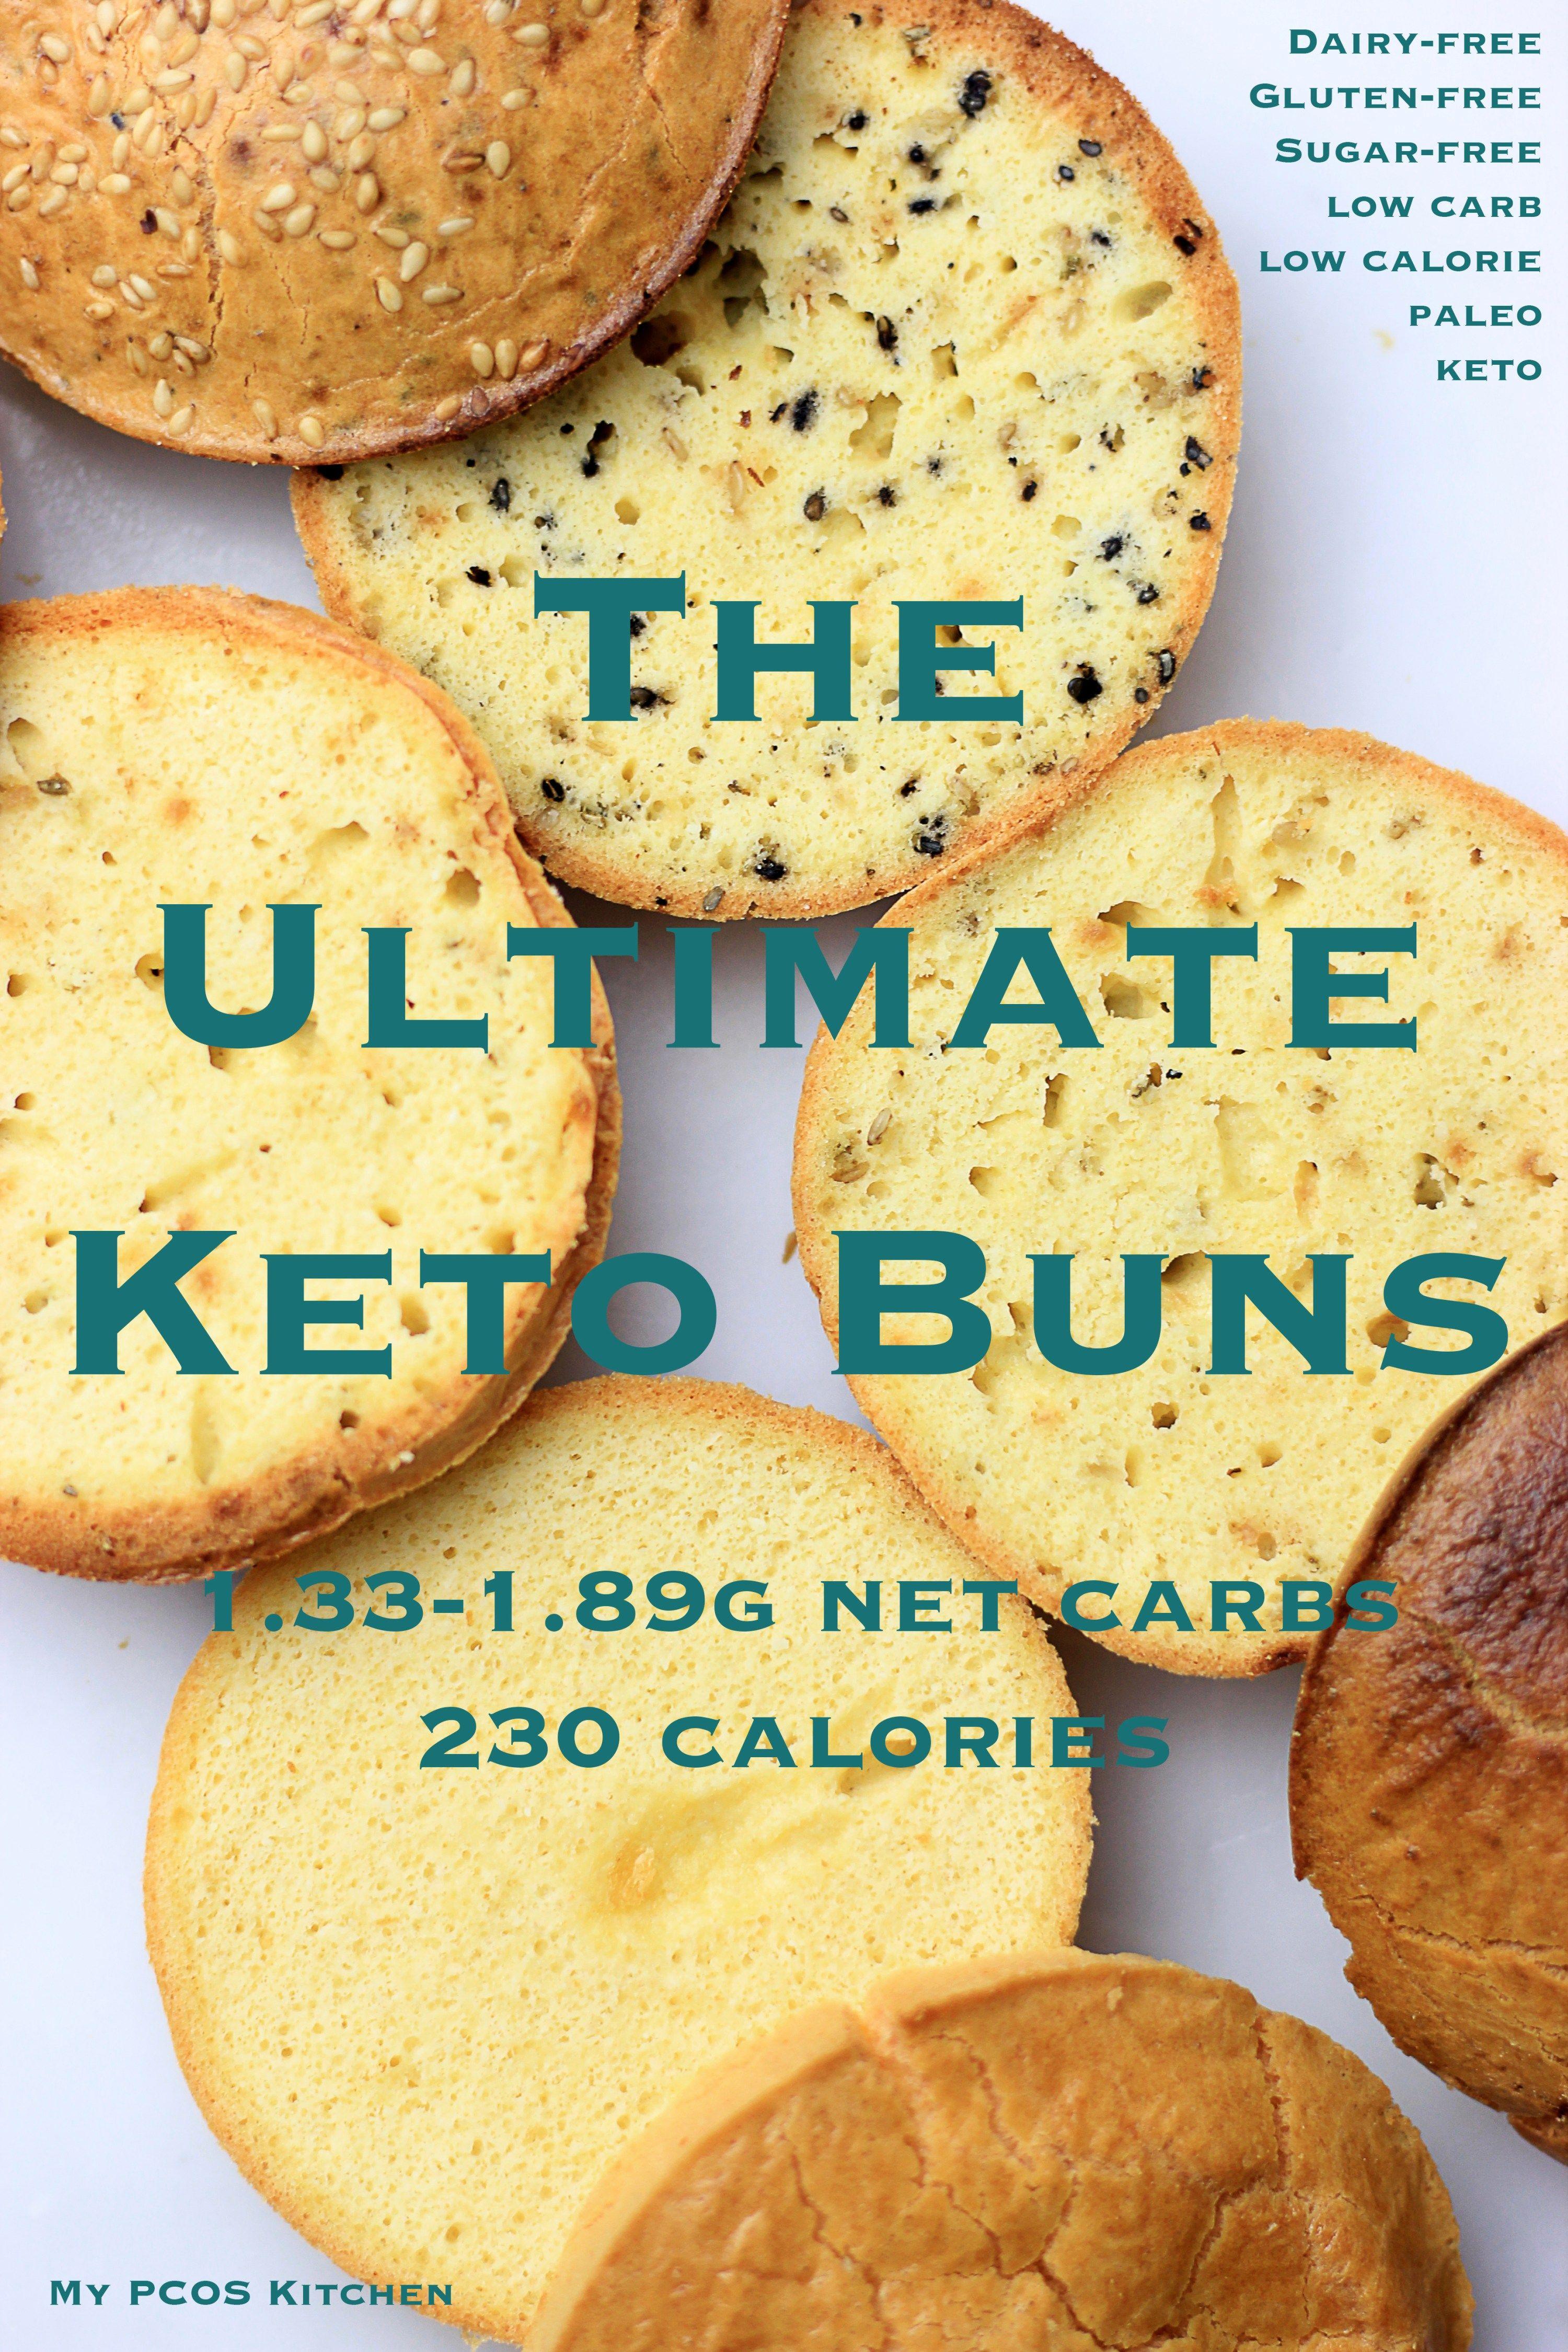 Best 25+ Keto burger ideas on Pinterest | Ketogenic recipes, Ketogenic Diet and Cloud bread keto